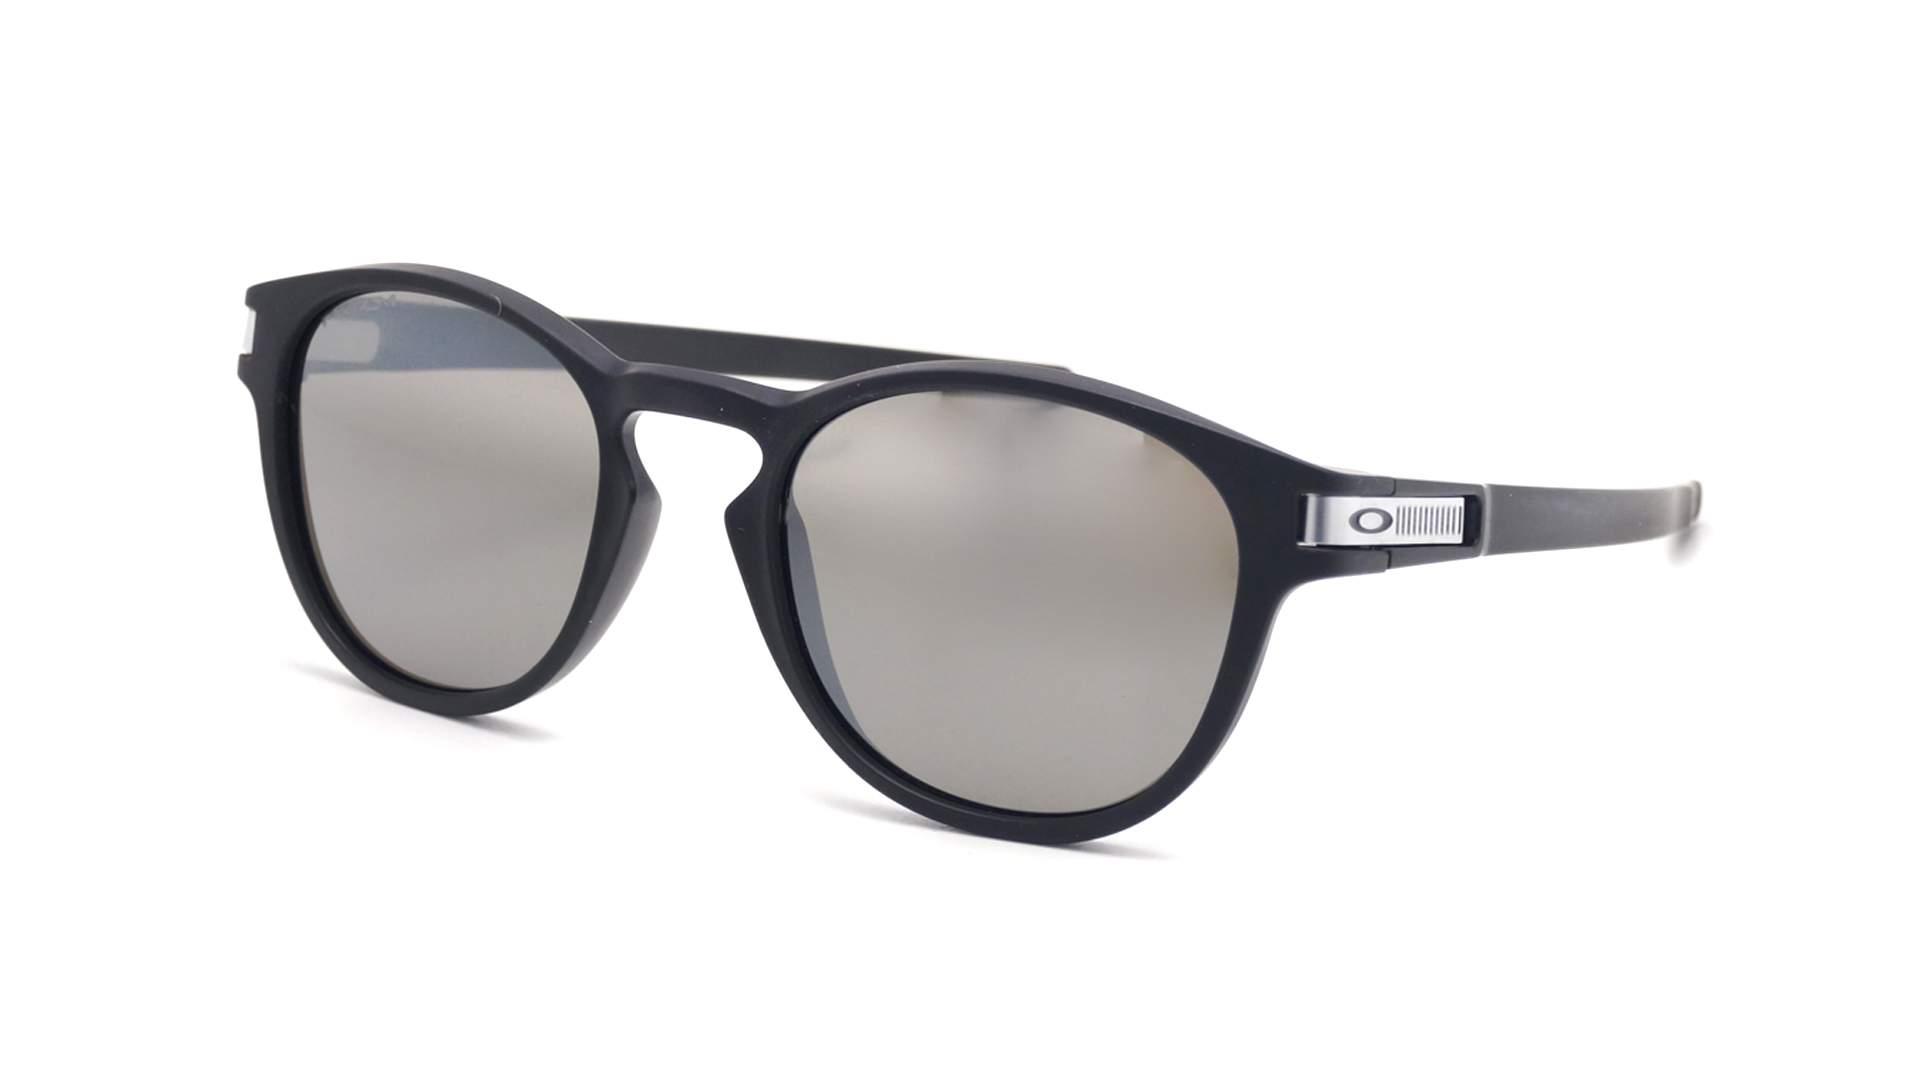 4c2e846d794 Sunglasses Oakley Latch Grid collection Black Matte OO9265 40 53-21 Medium